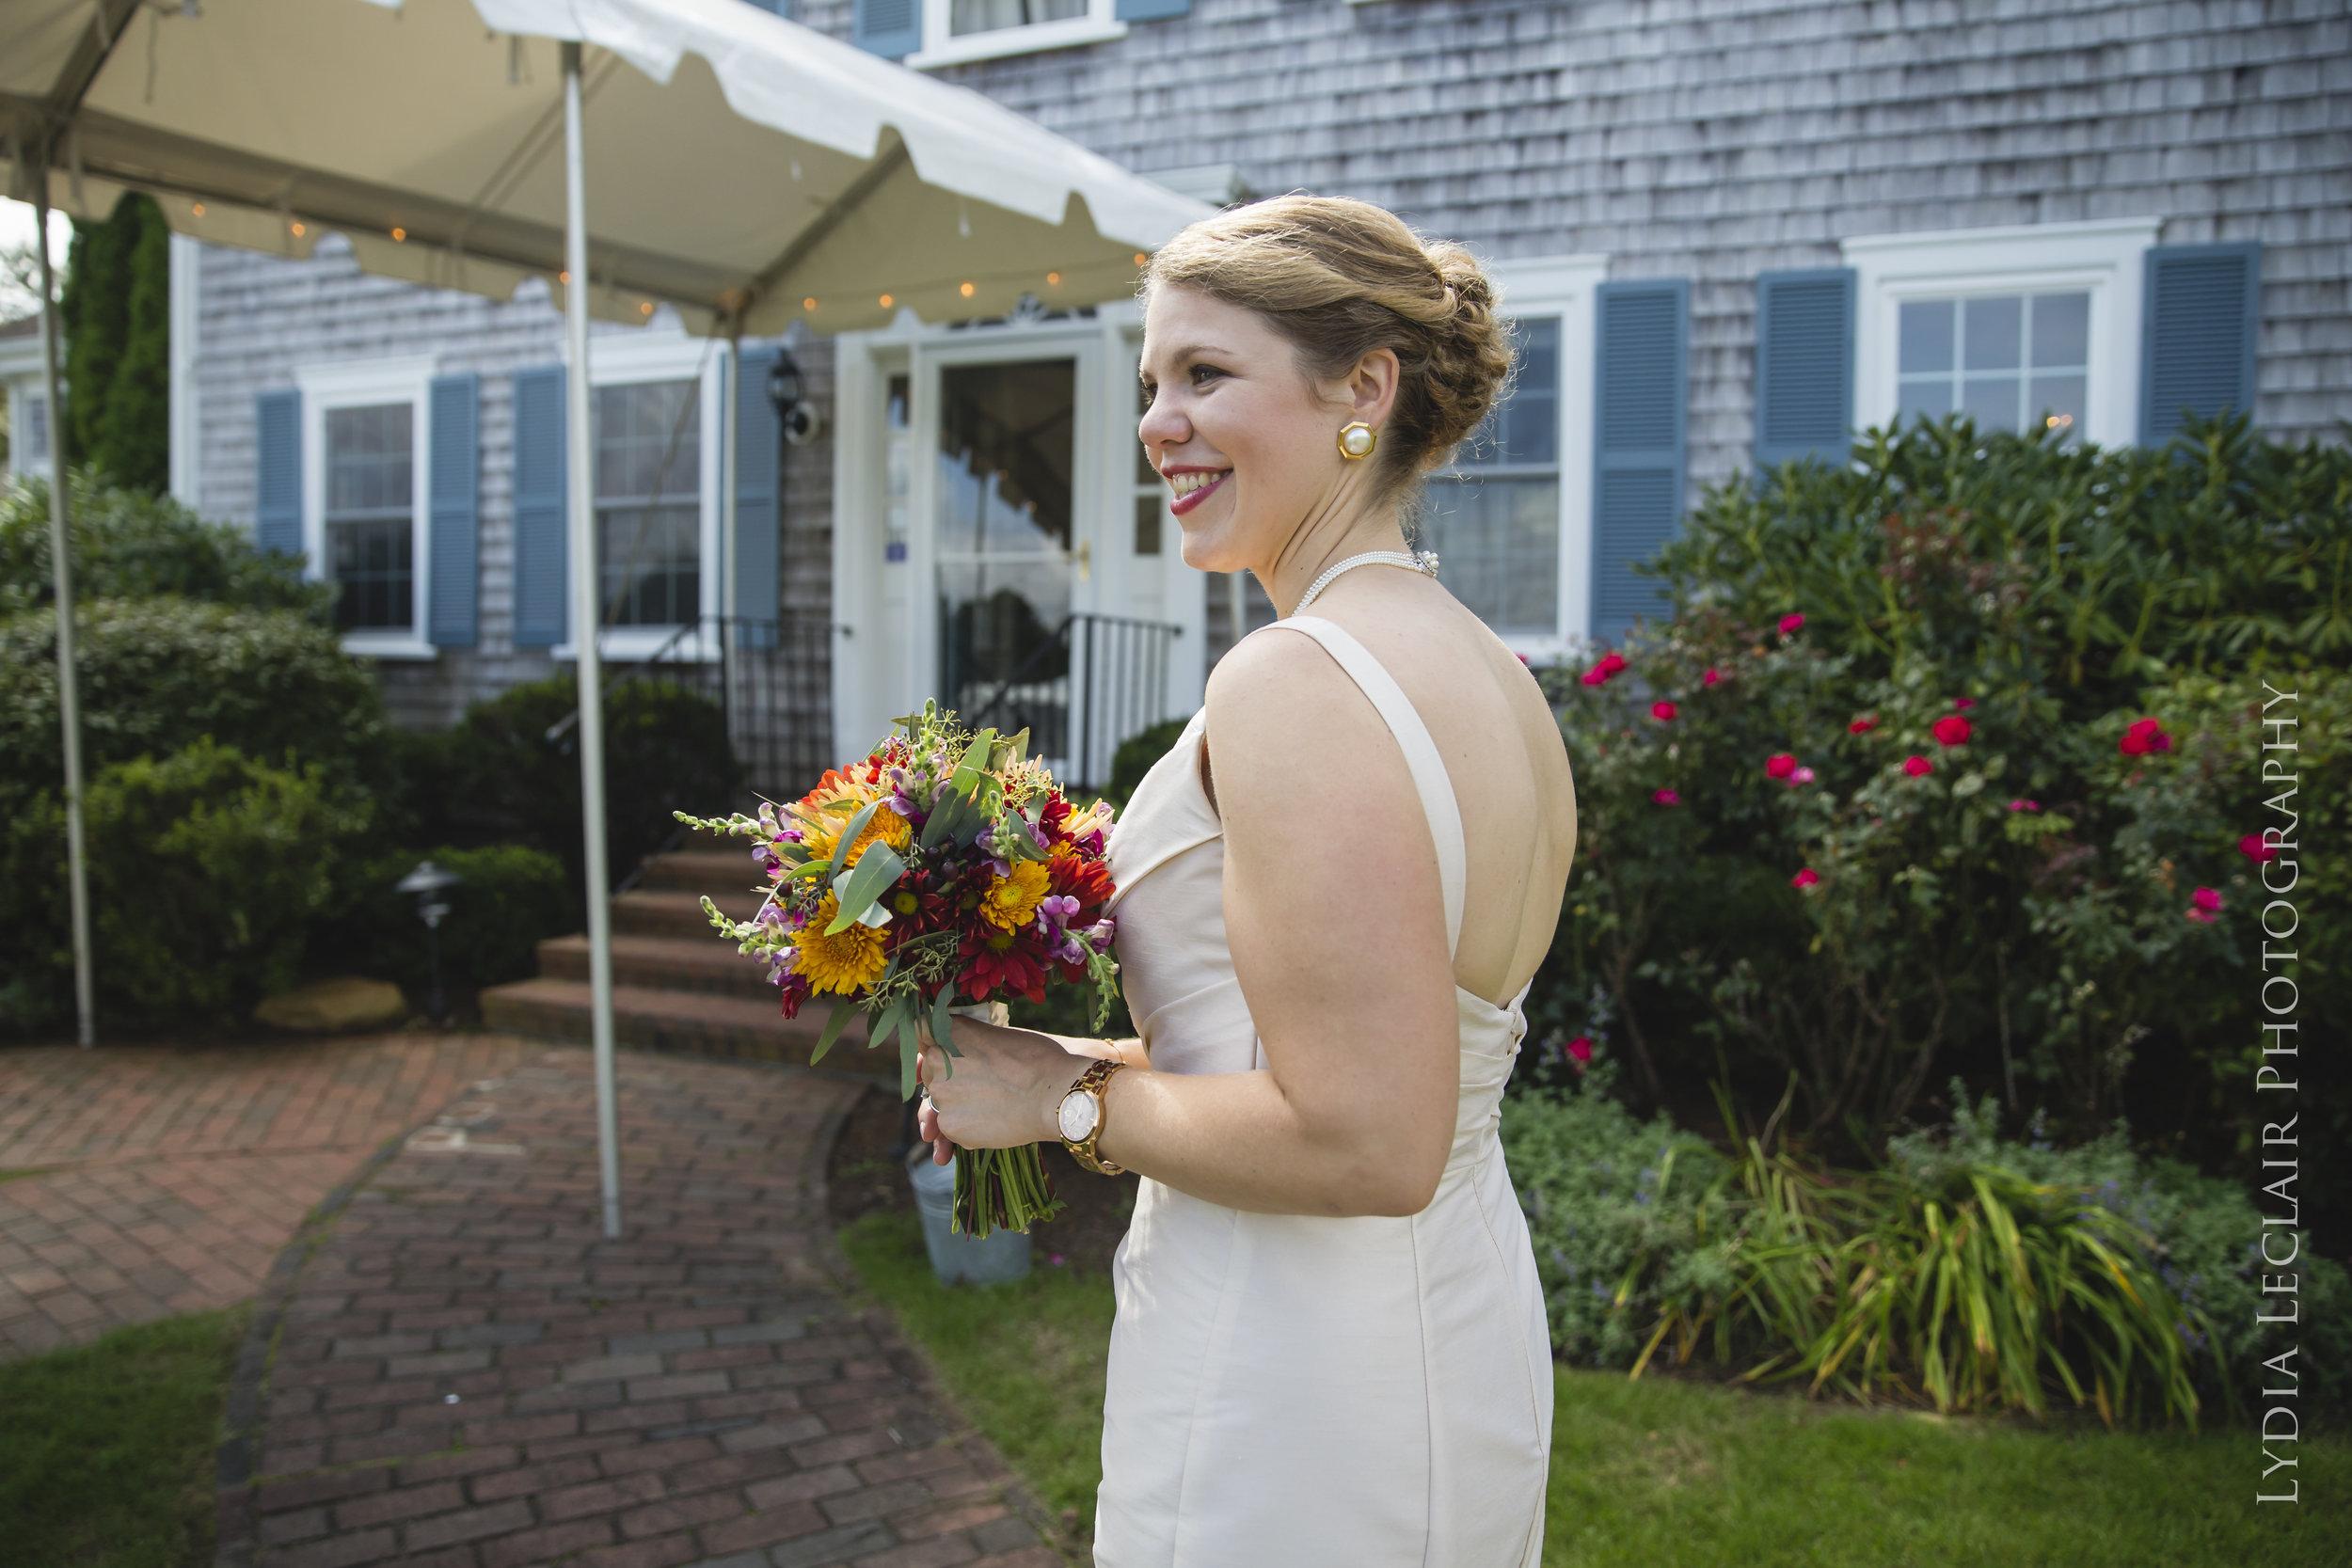 LydiaLeclairPhotography-wedding-3.jpg